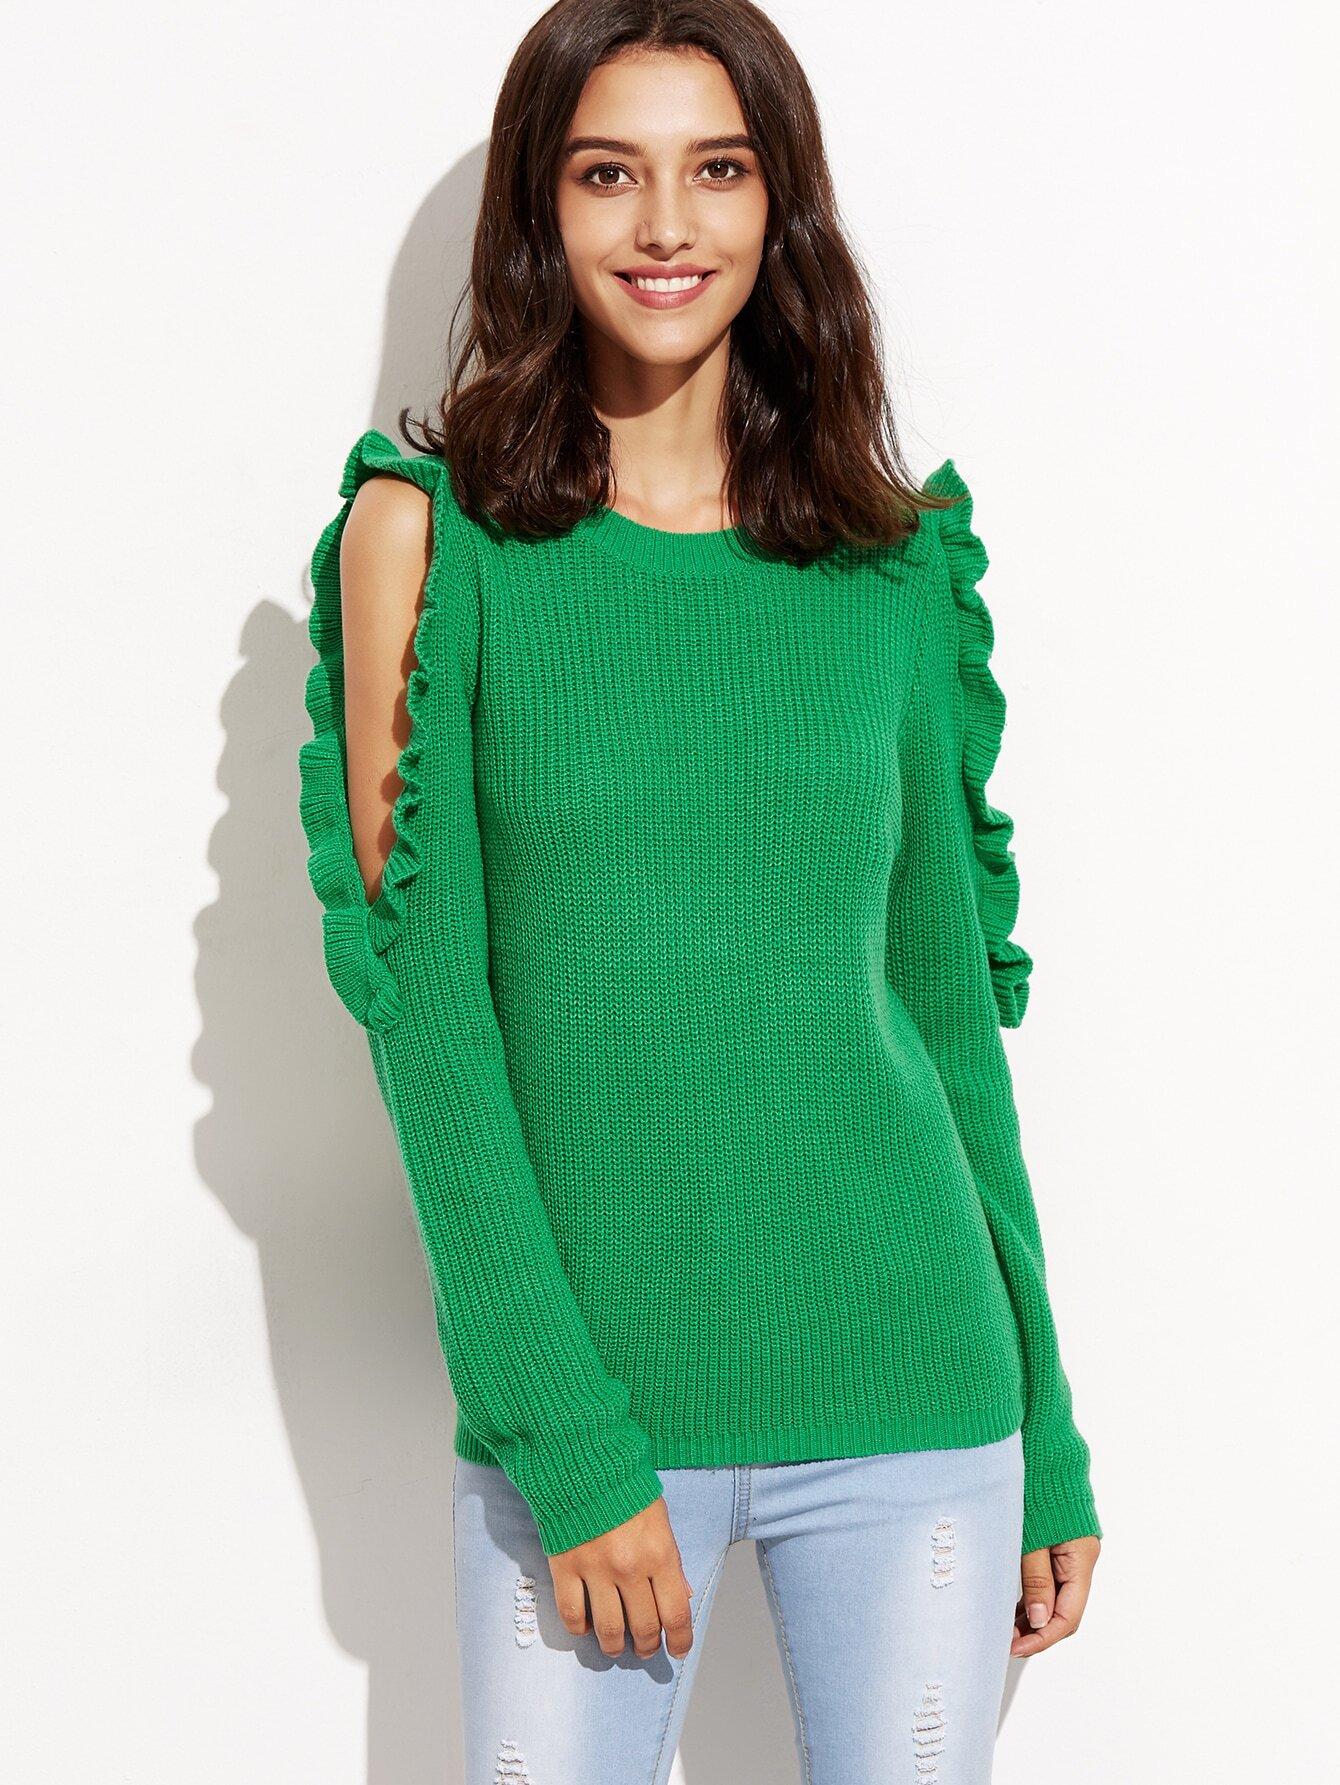 sweater160825707_2